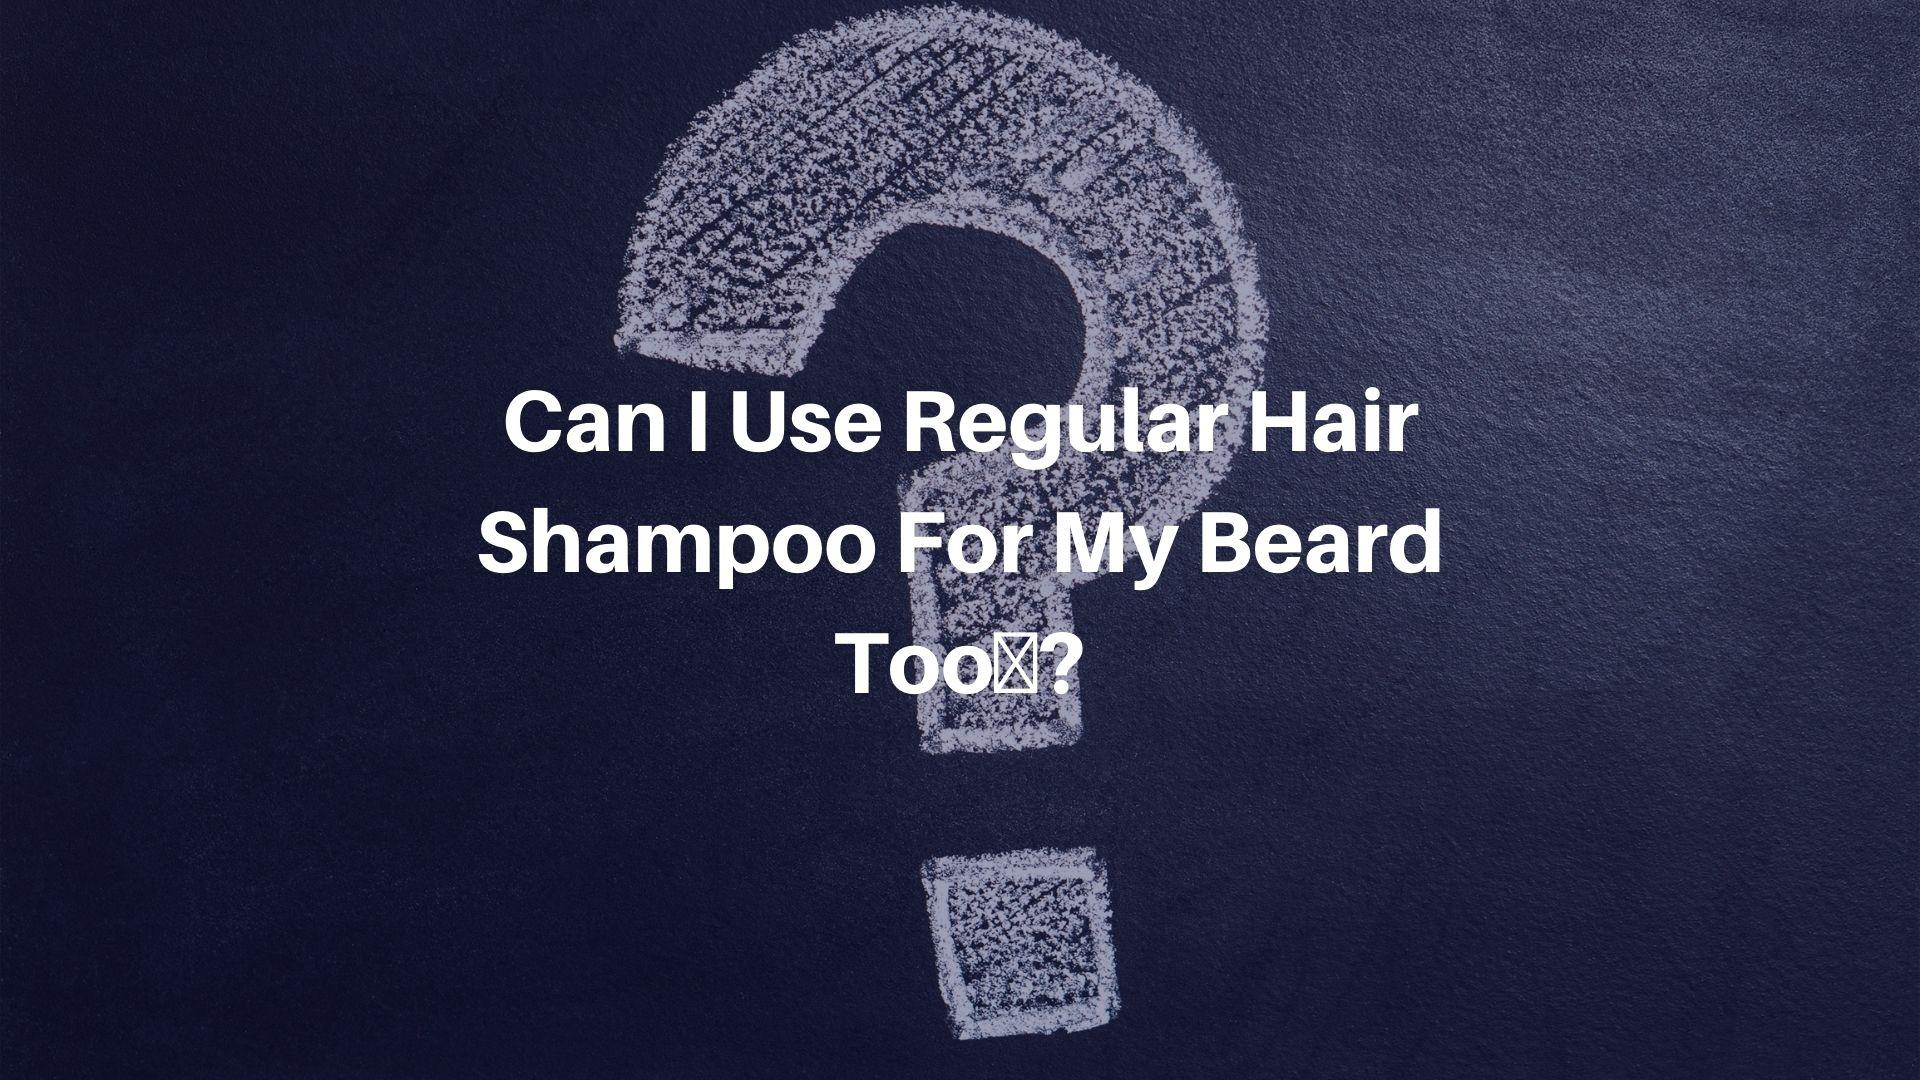 Can I Use Regular Hair Shampoo For My Beard Too?